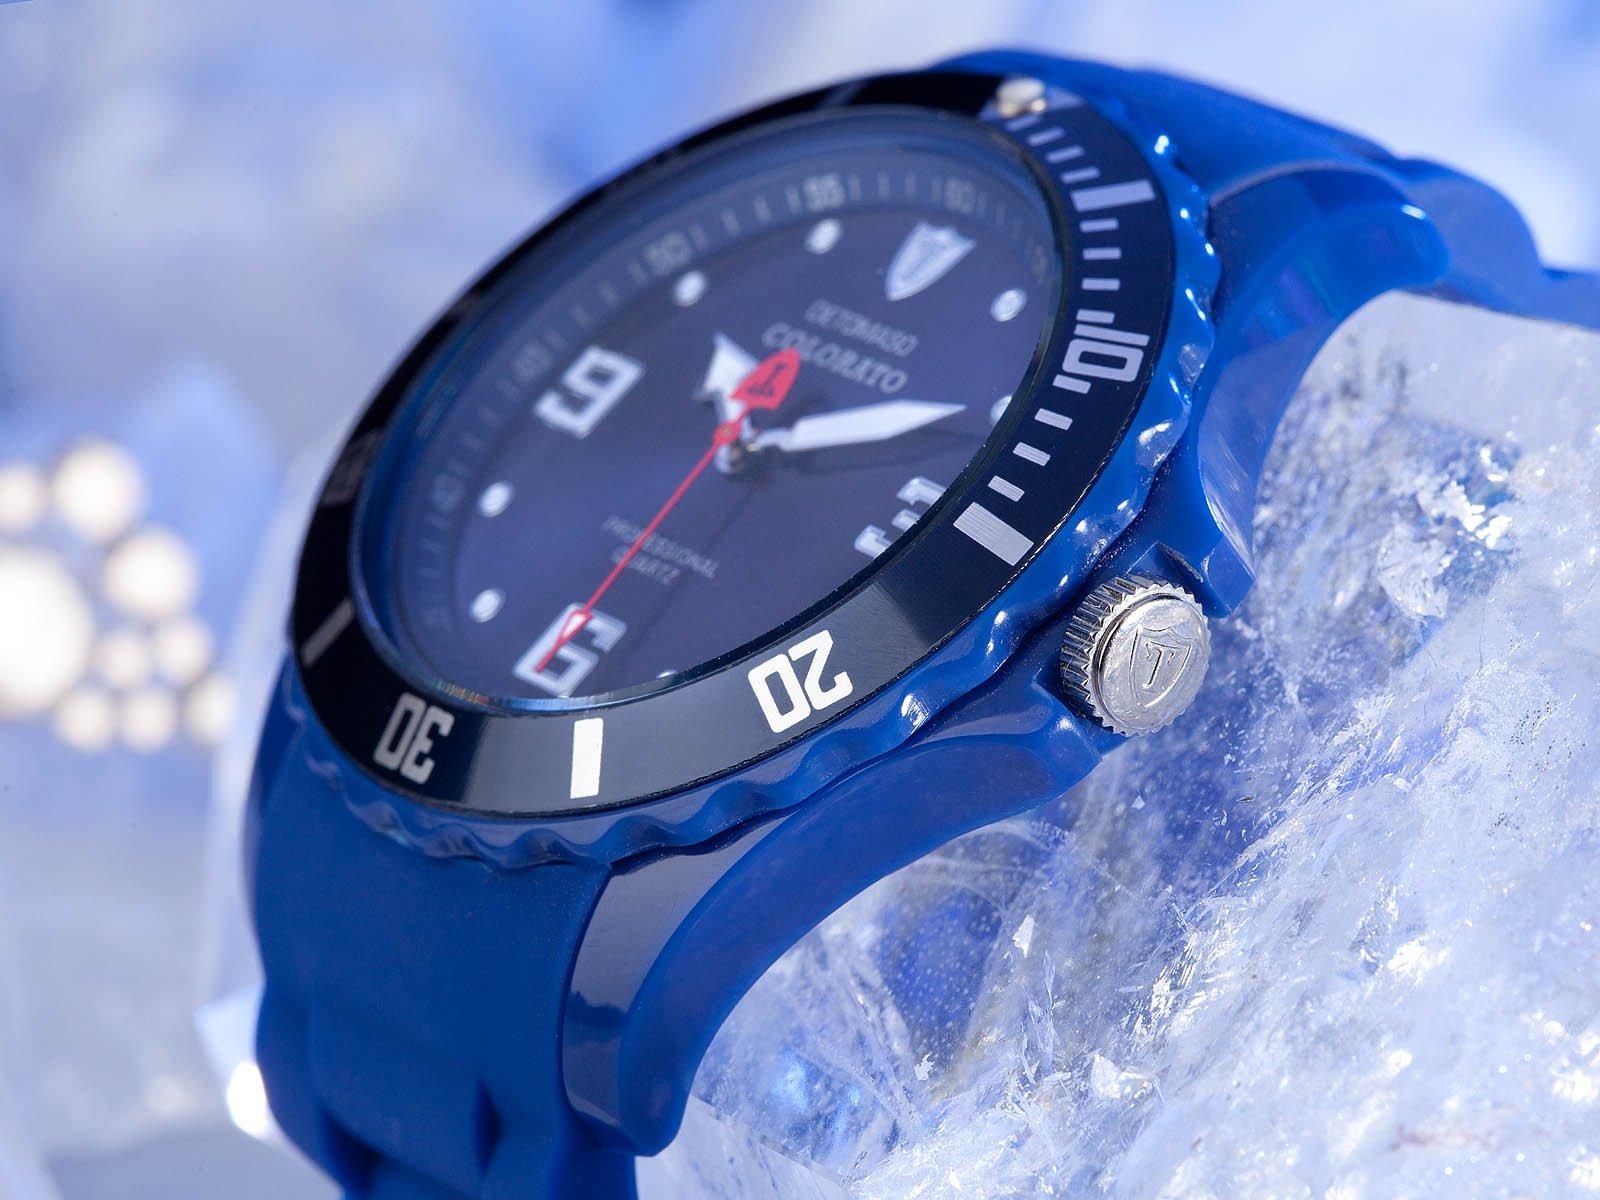 Detomaso DETOMASO COLORATO DT2012-N Trend DT2012-N – Reloj analógico de Cuarzo Unisex, Correa de Silicona Color Azul (Agujas luminiscentes, Cifras luminiscentes)